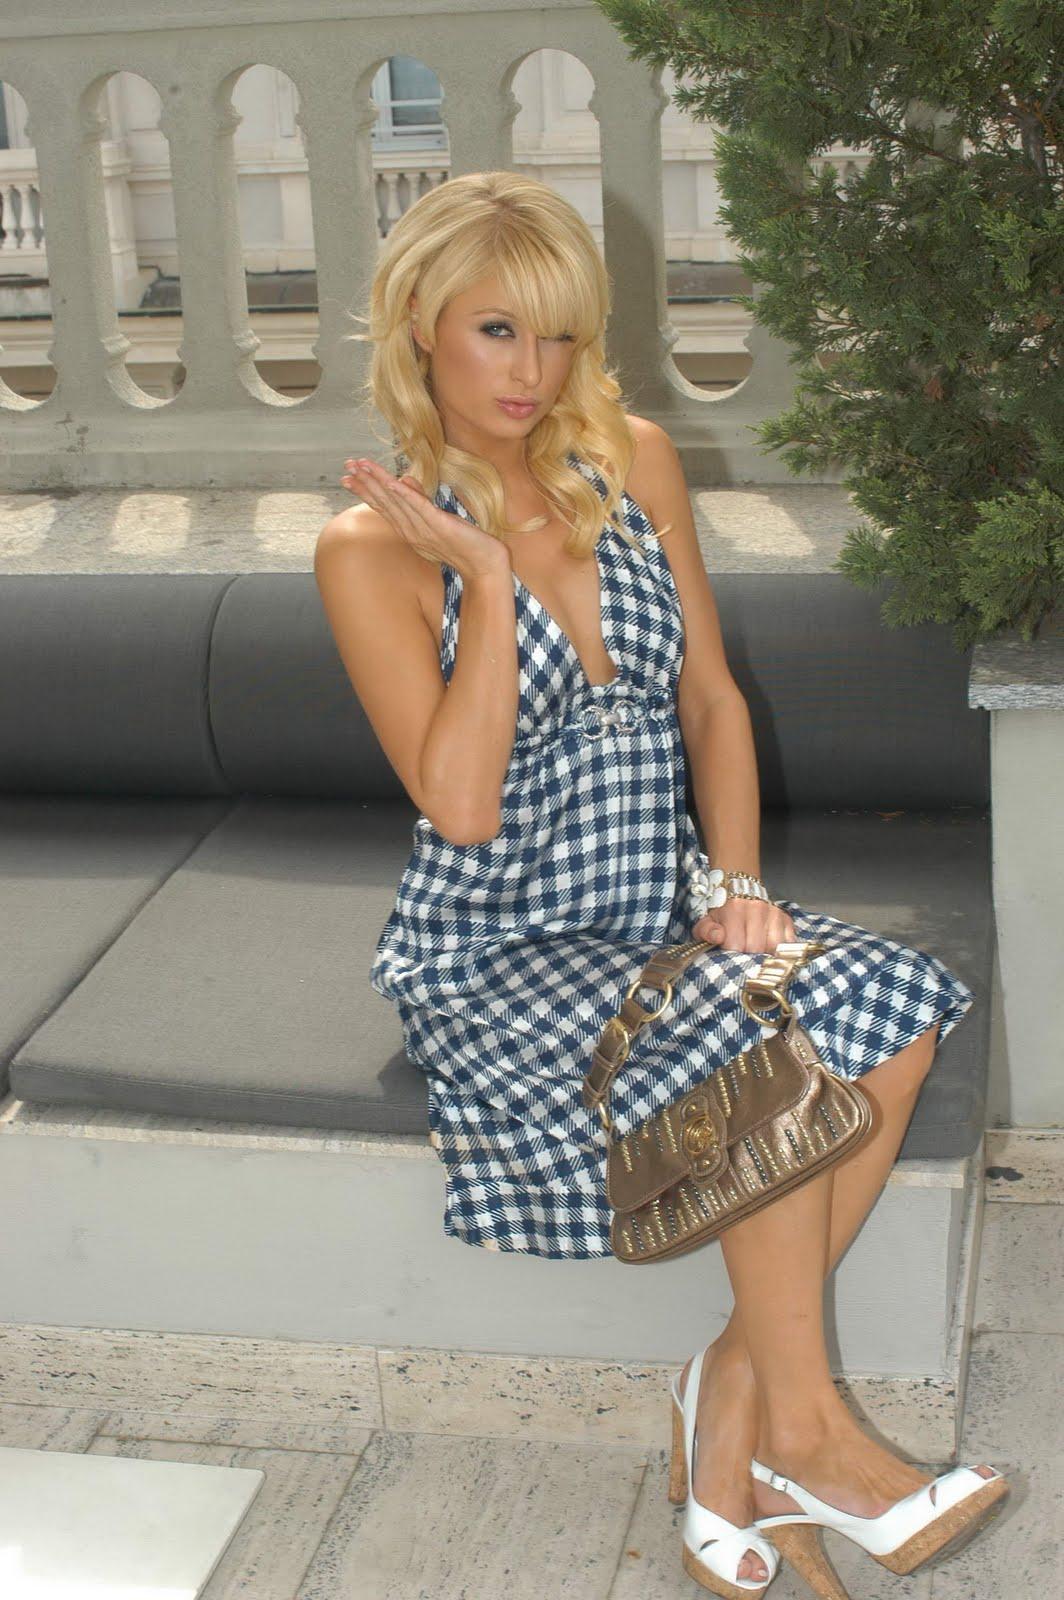 Levi Wallpaper Iphone Paris Hilton Latest Hd Wallpapers